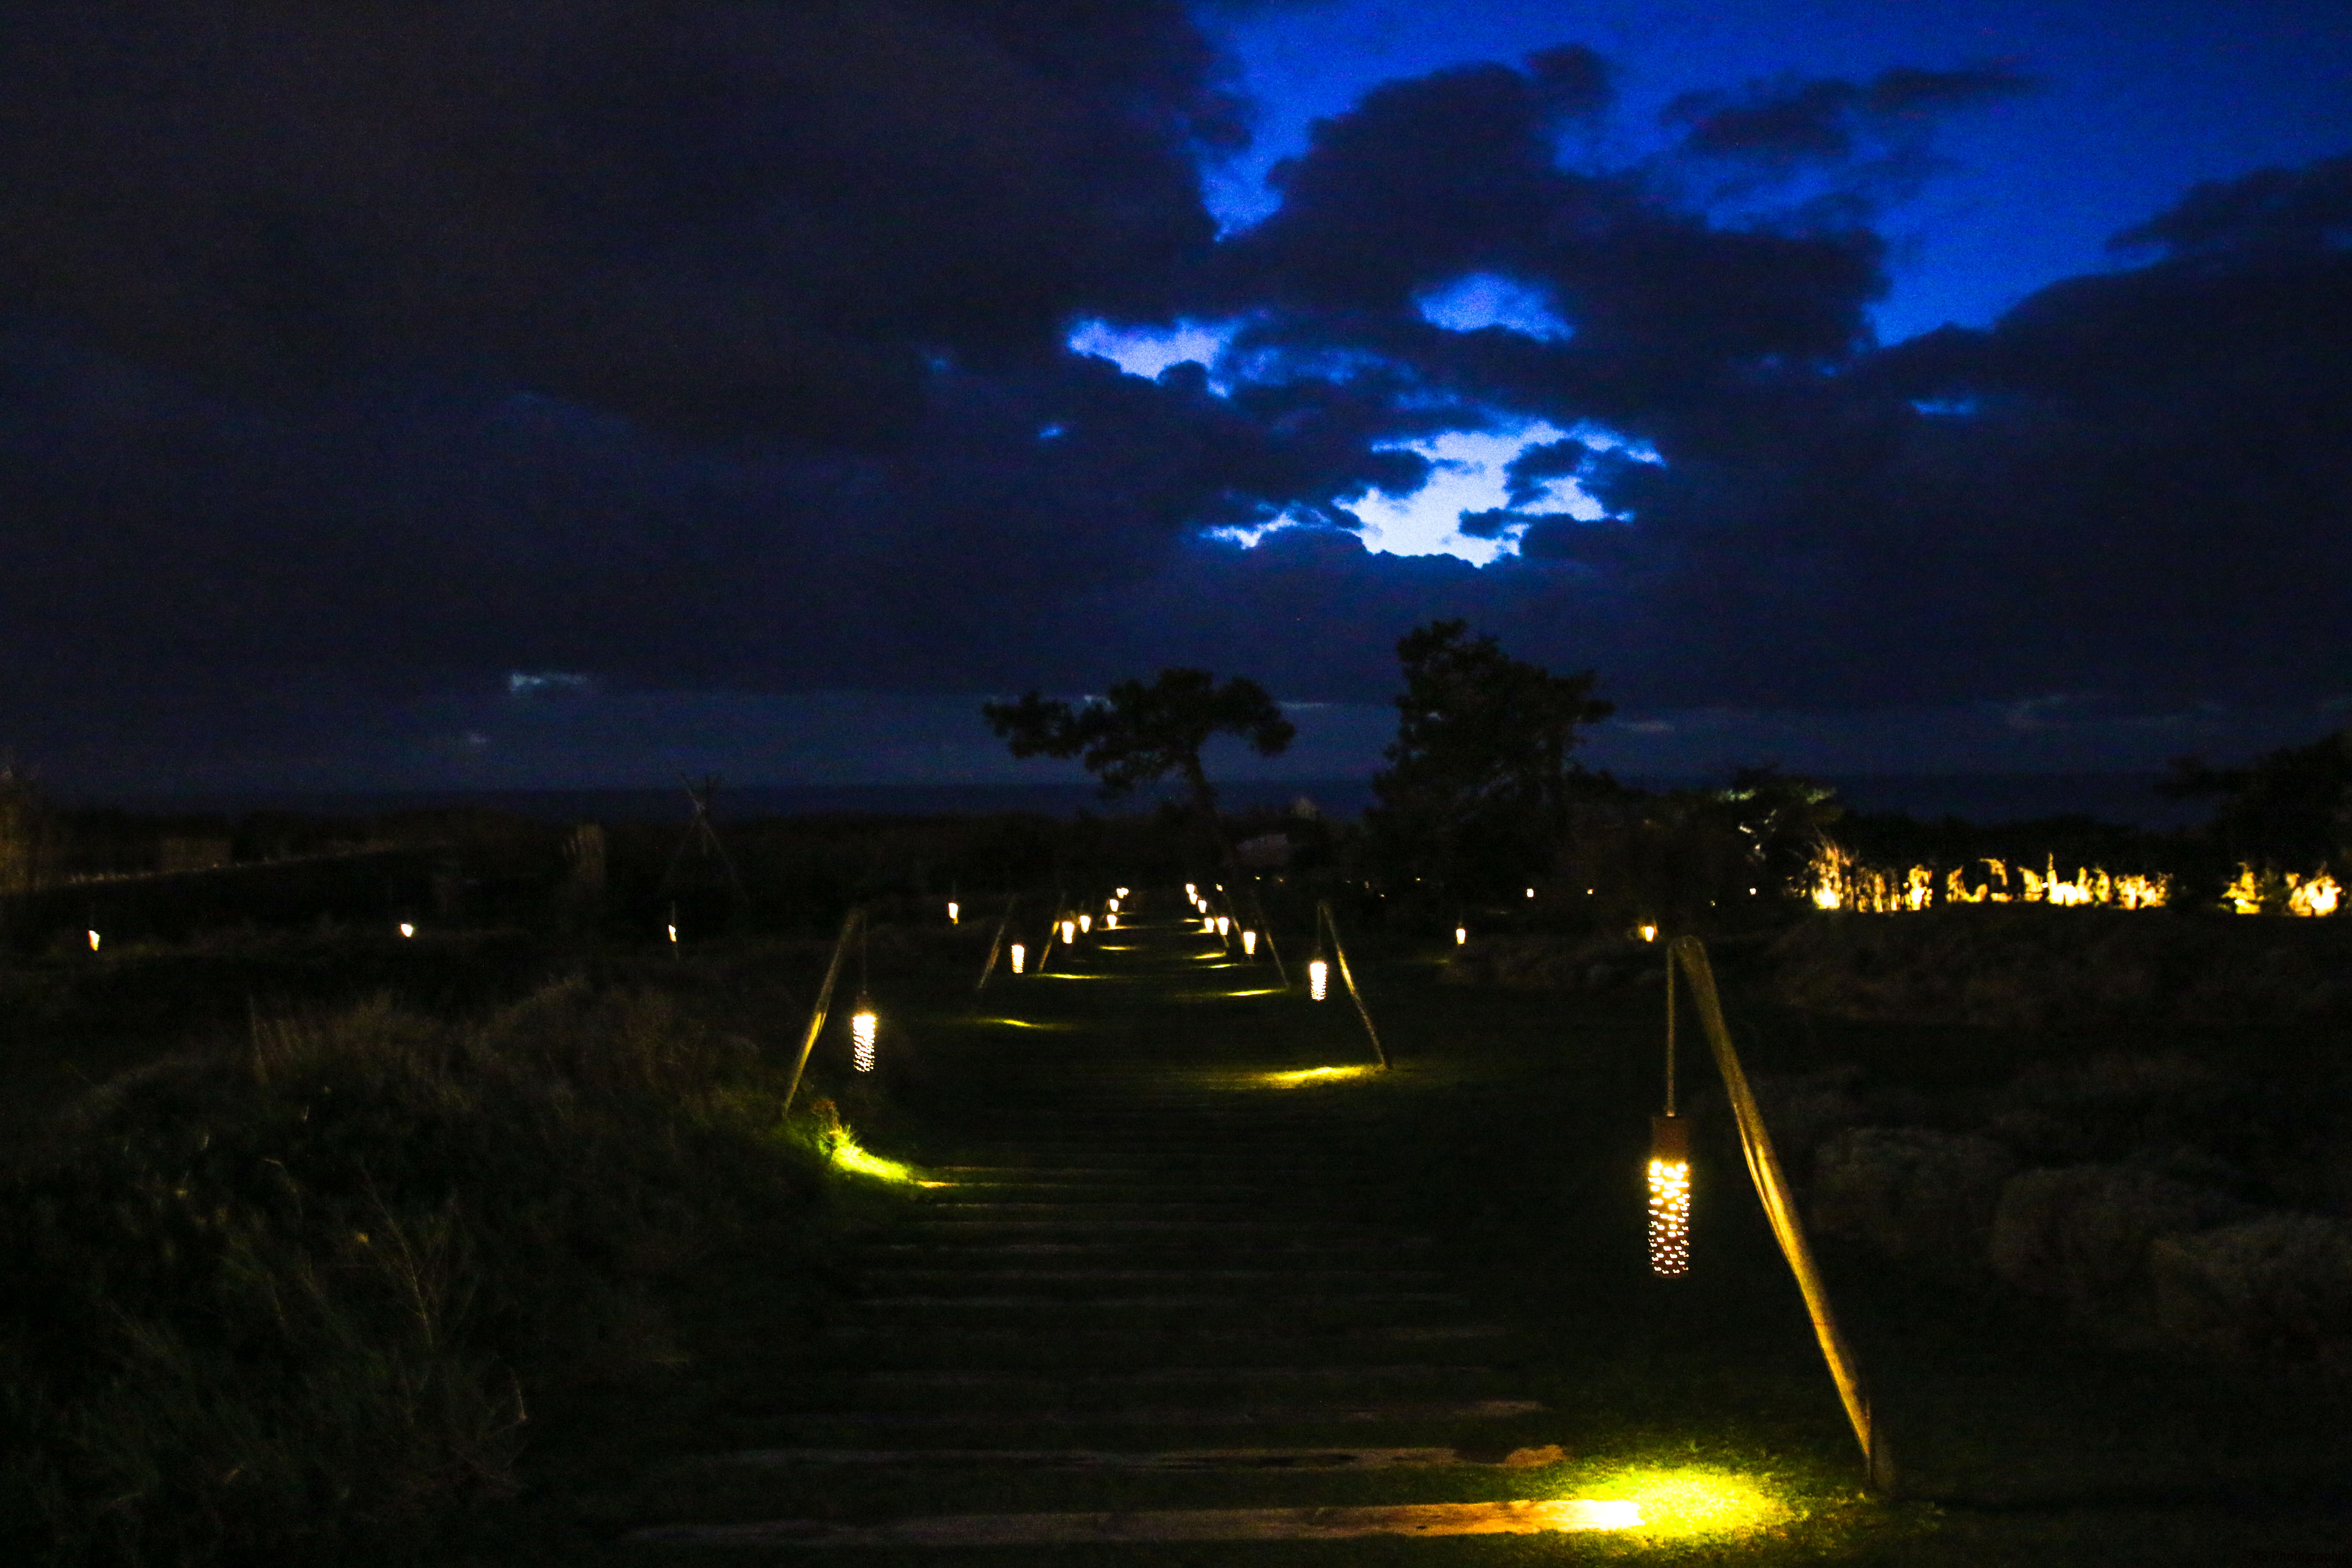 volvoXC4064-volvo-xc40-hotel-Areias do Seixos-Arnaud Demasier-RSPhotographie